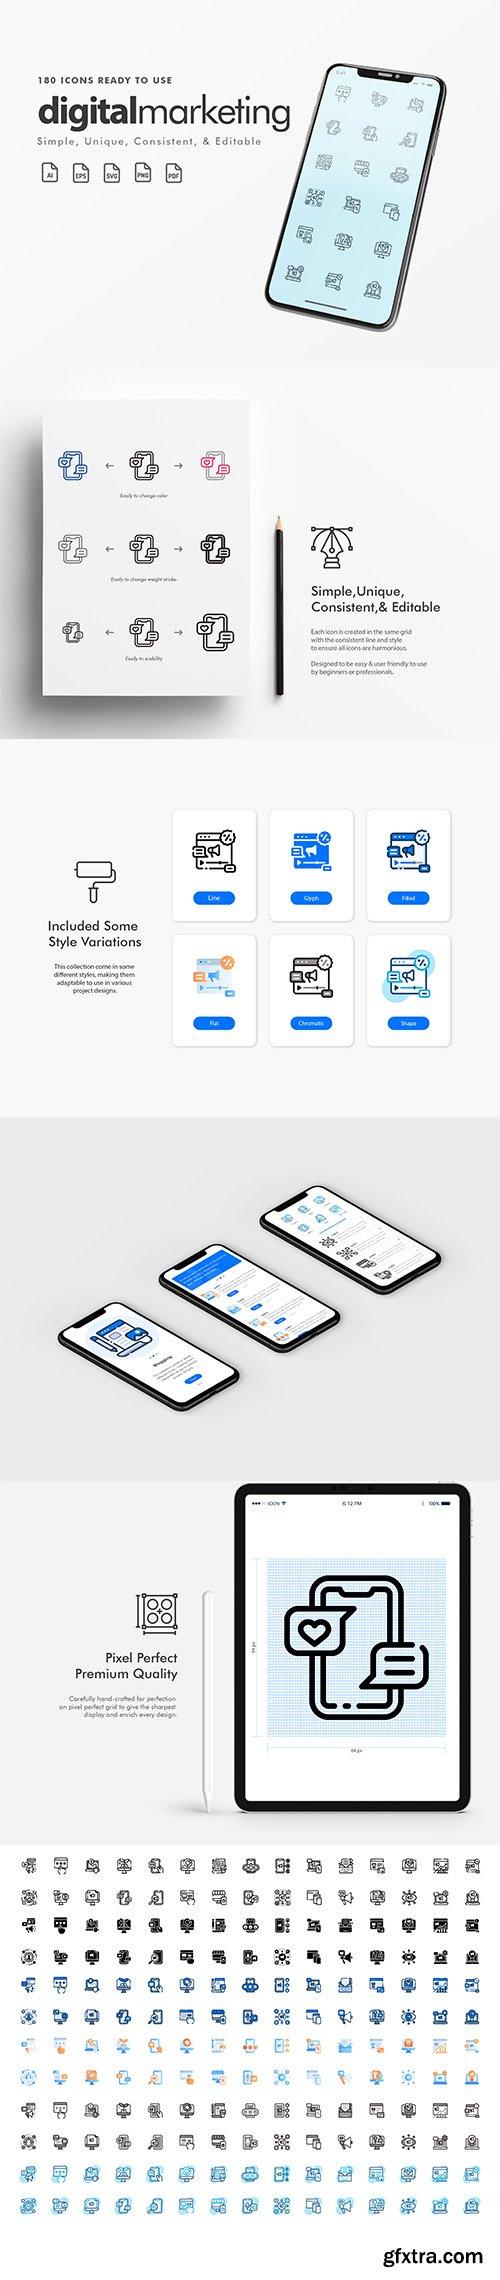 180 Simple, Unique, Consistent & Editable Digital Marketing Icons